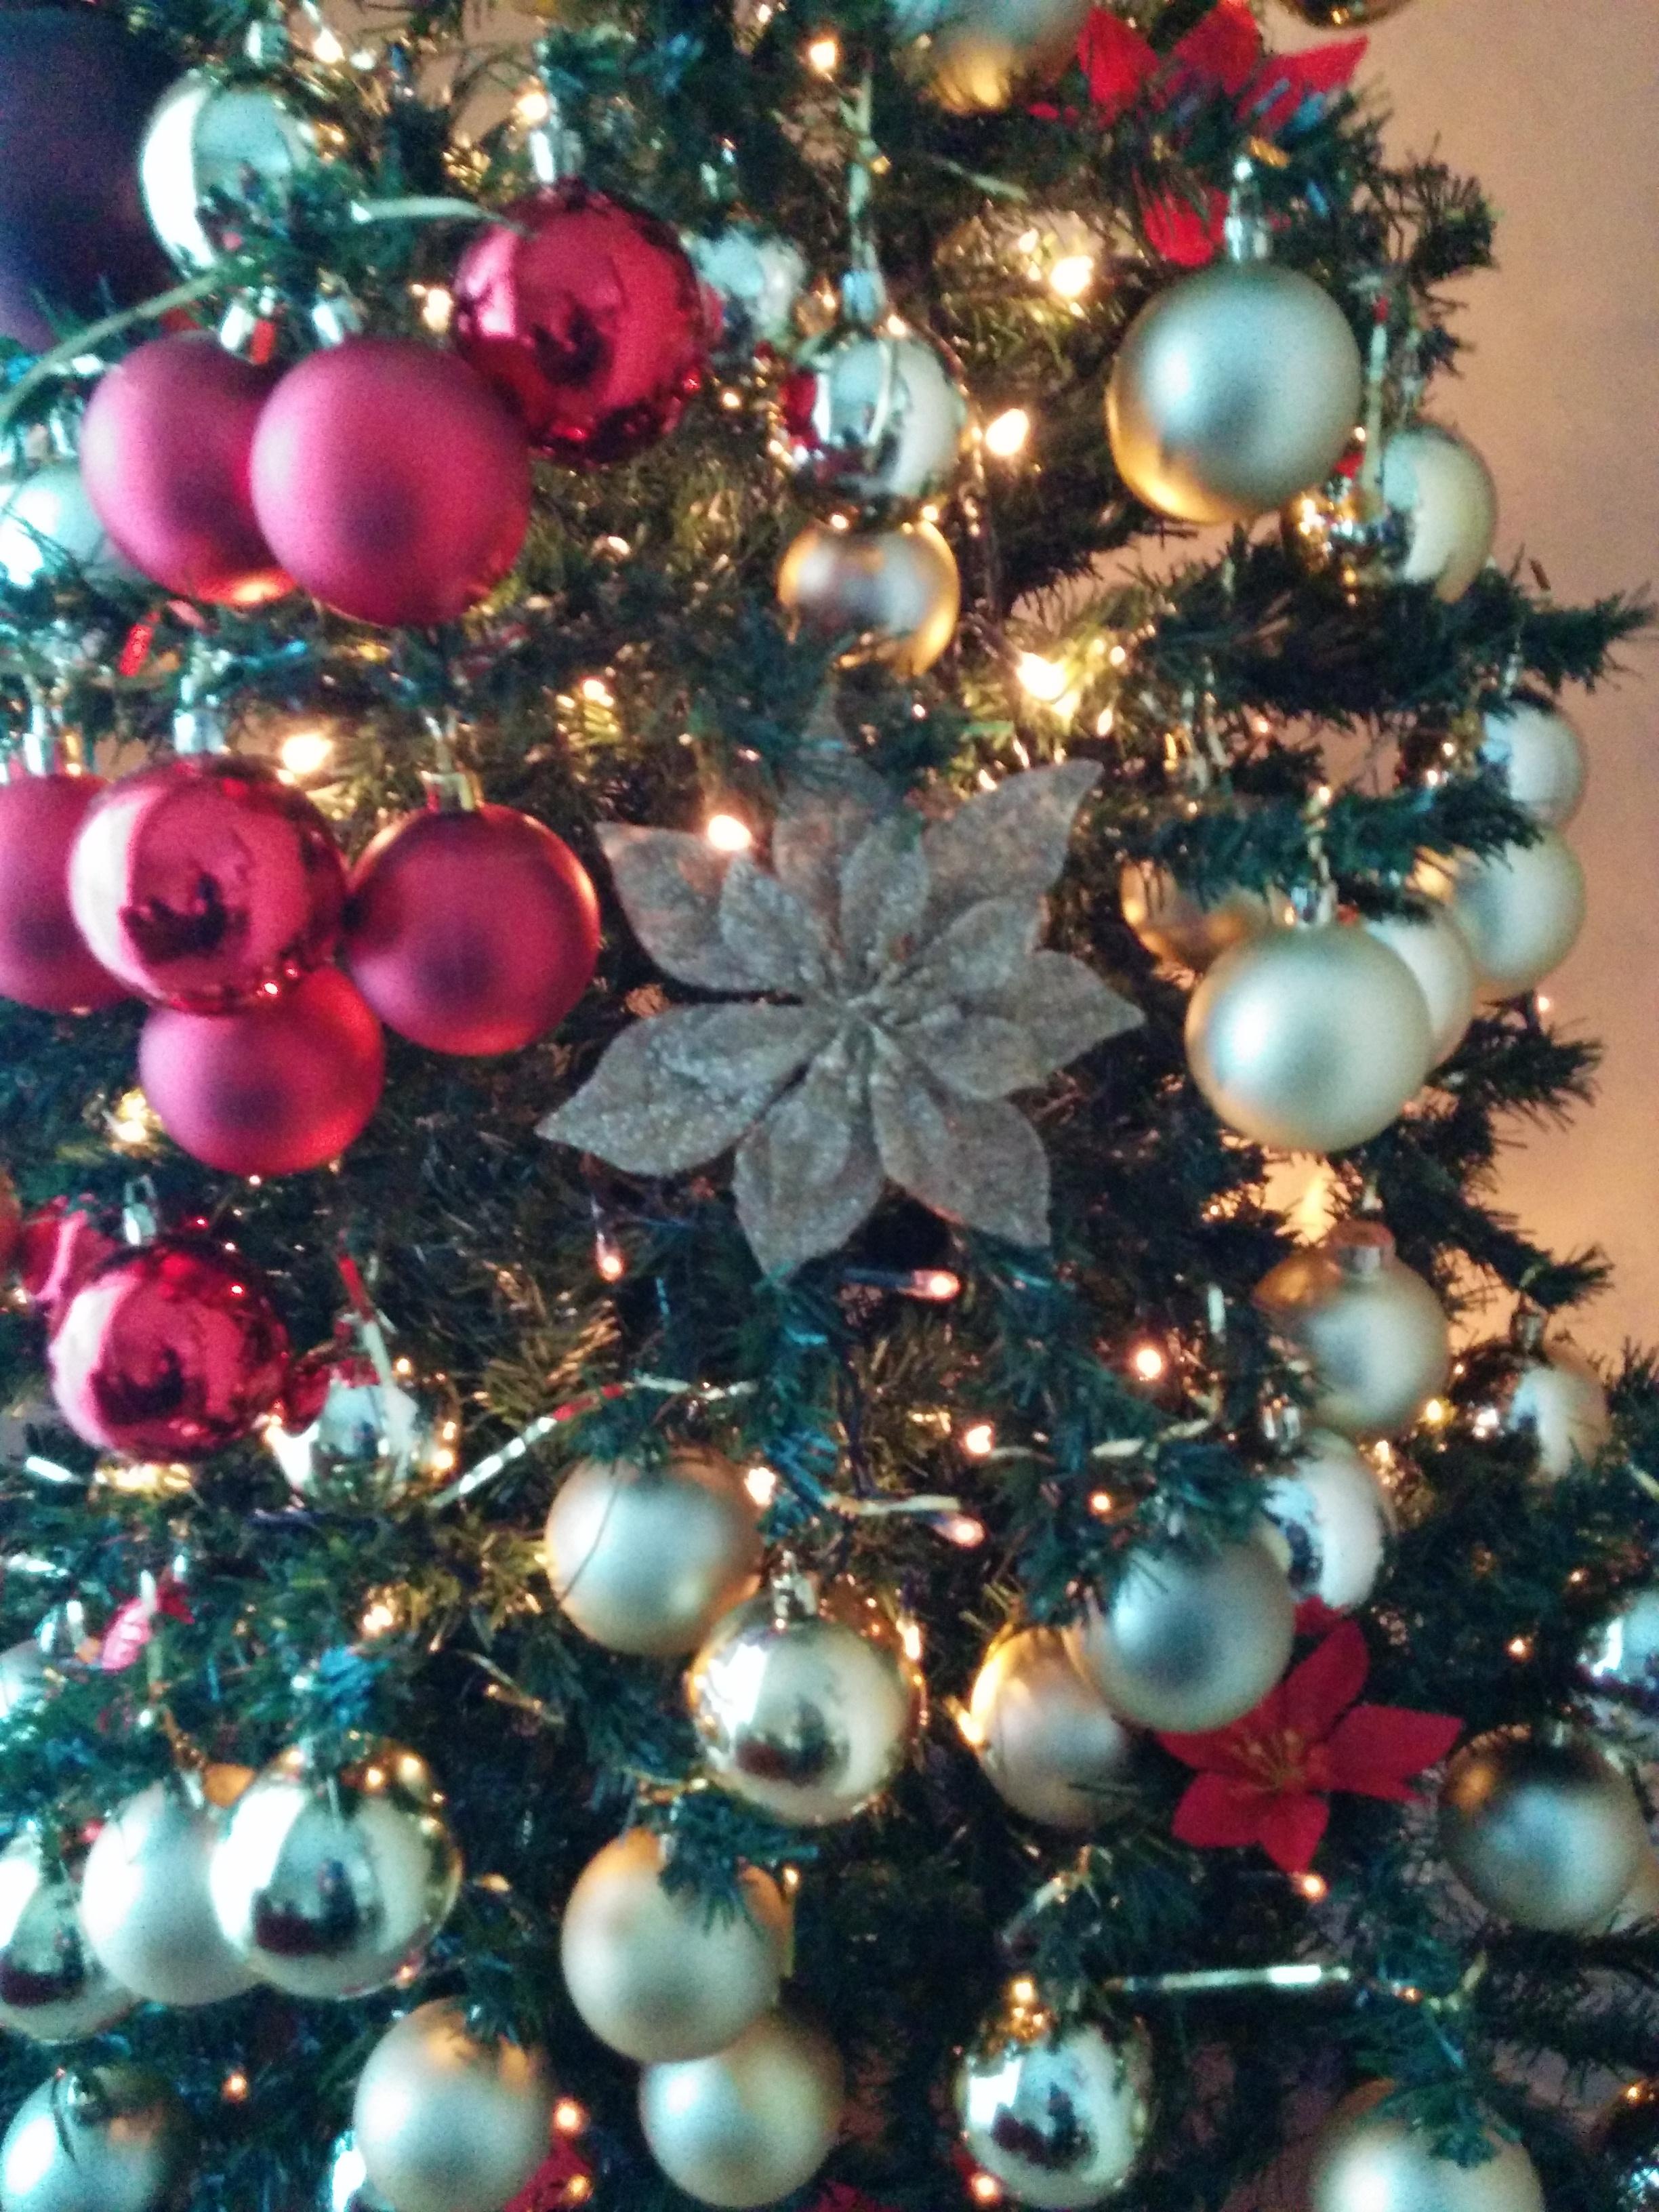 Bon Nadal 2015/Merry Christmas